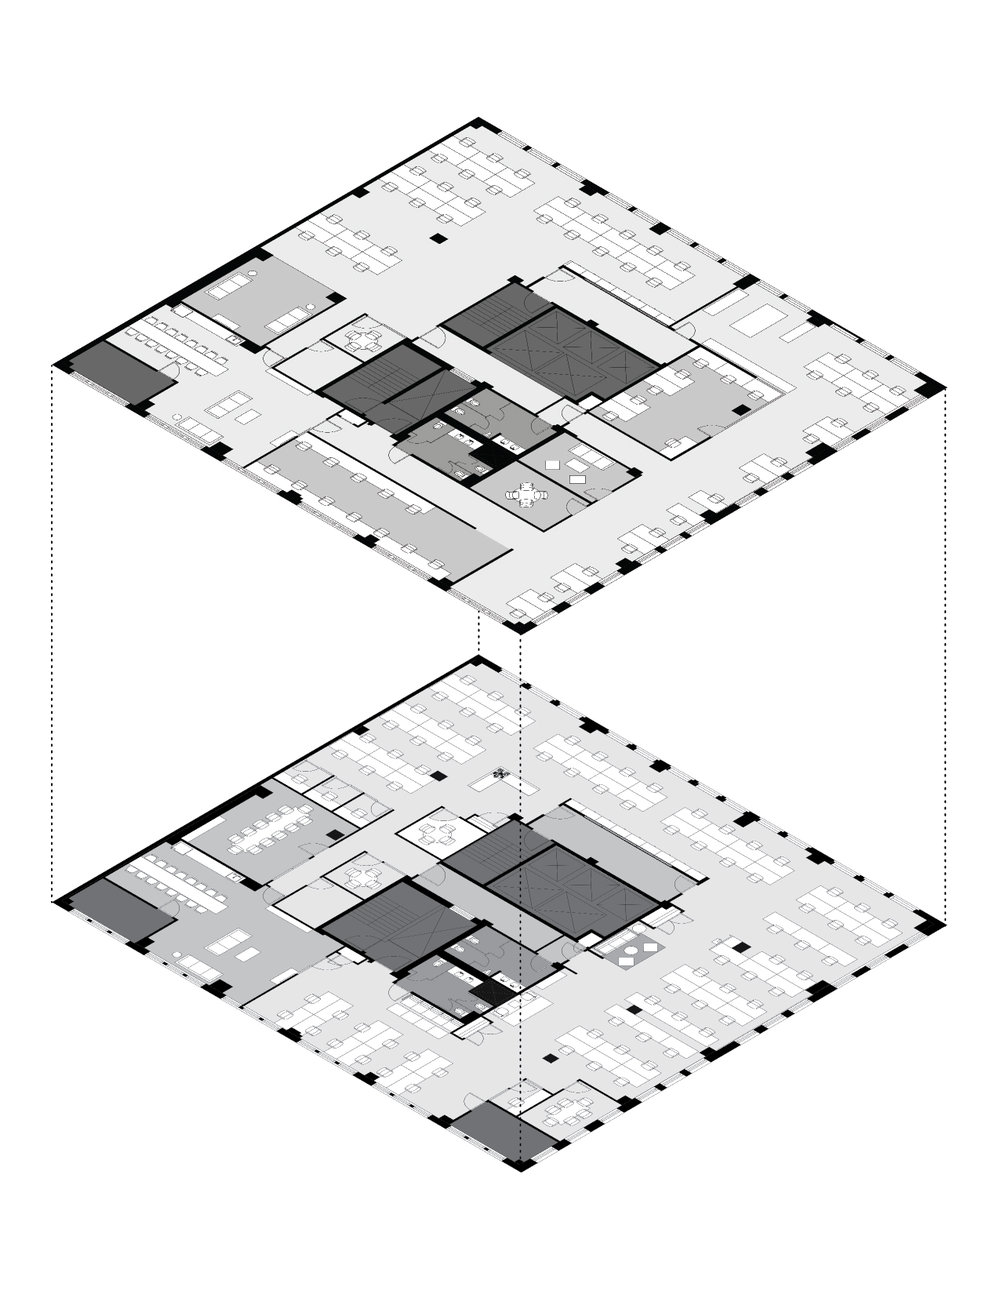 MEDIARADAR_AXO PLANS_073118-01.jpg